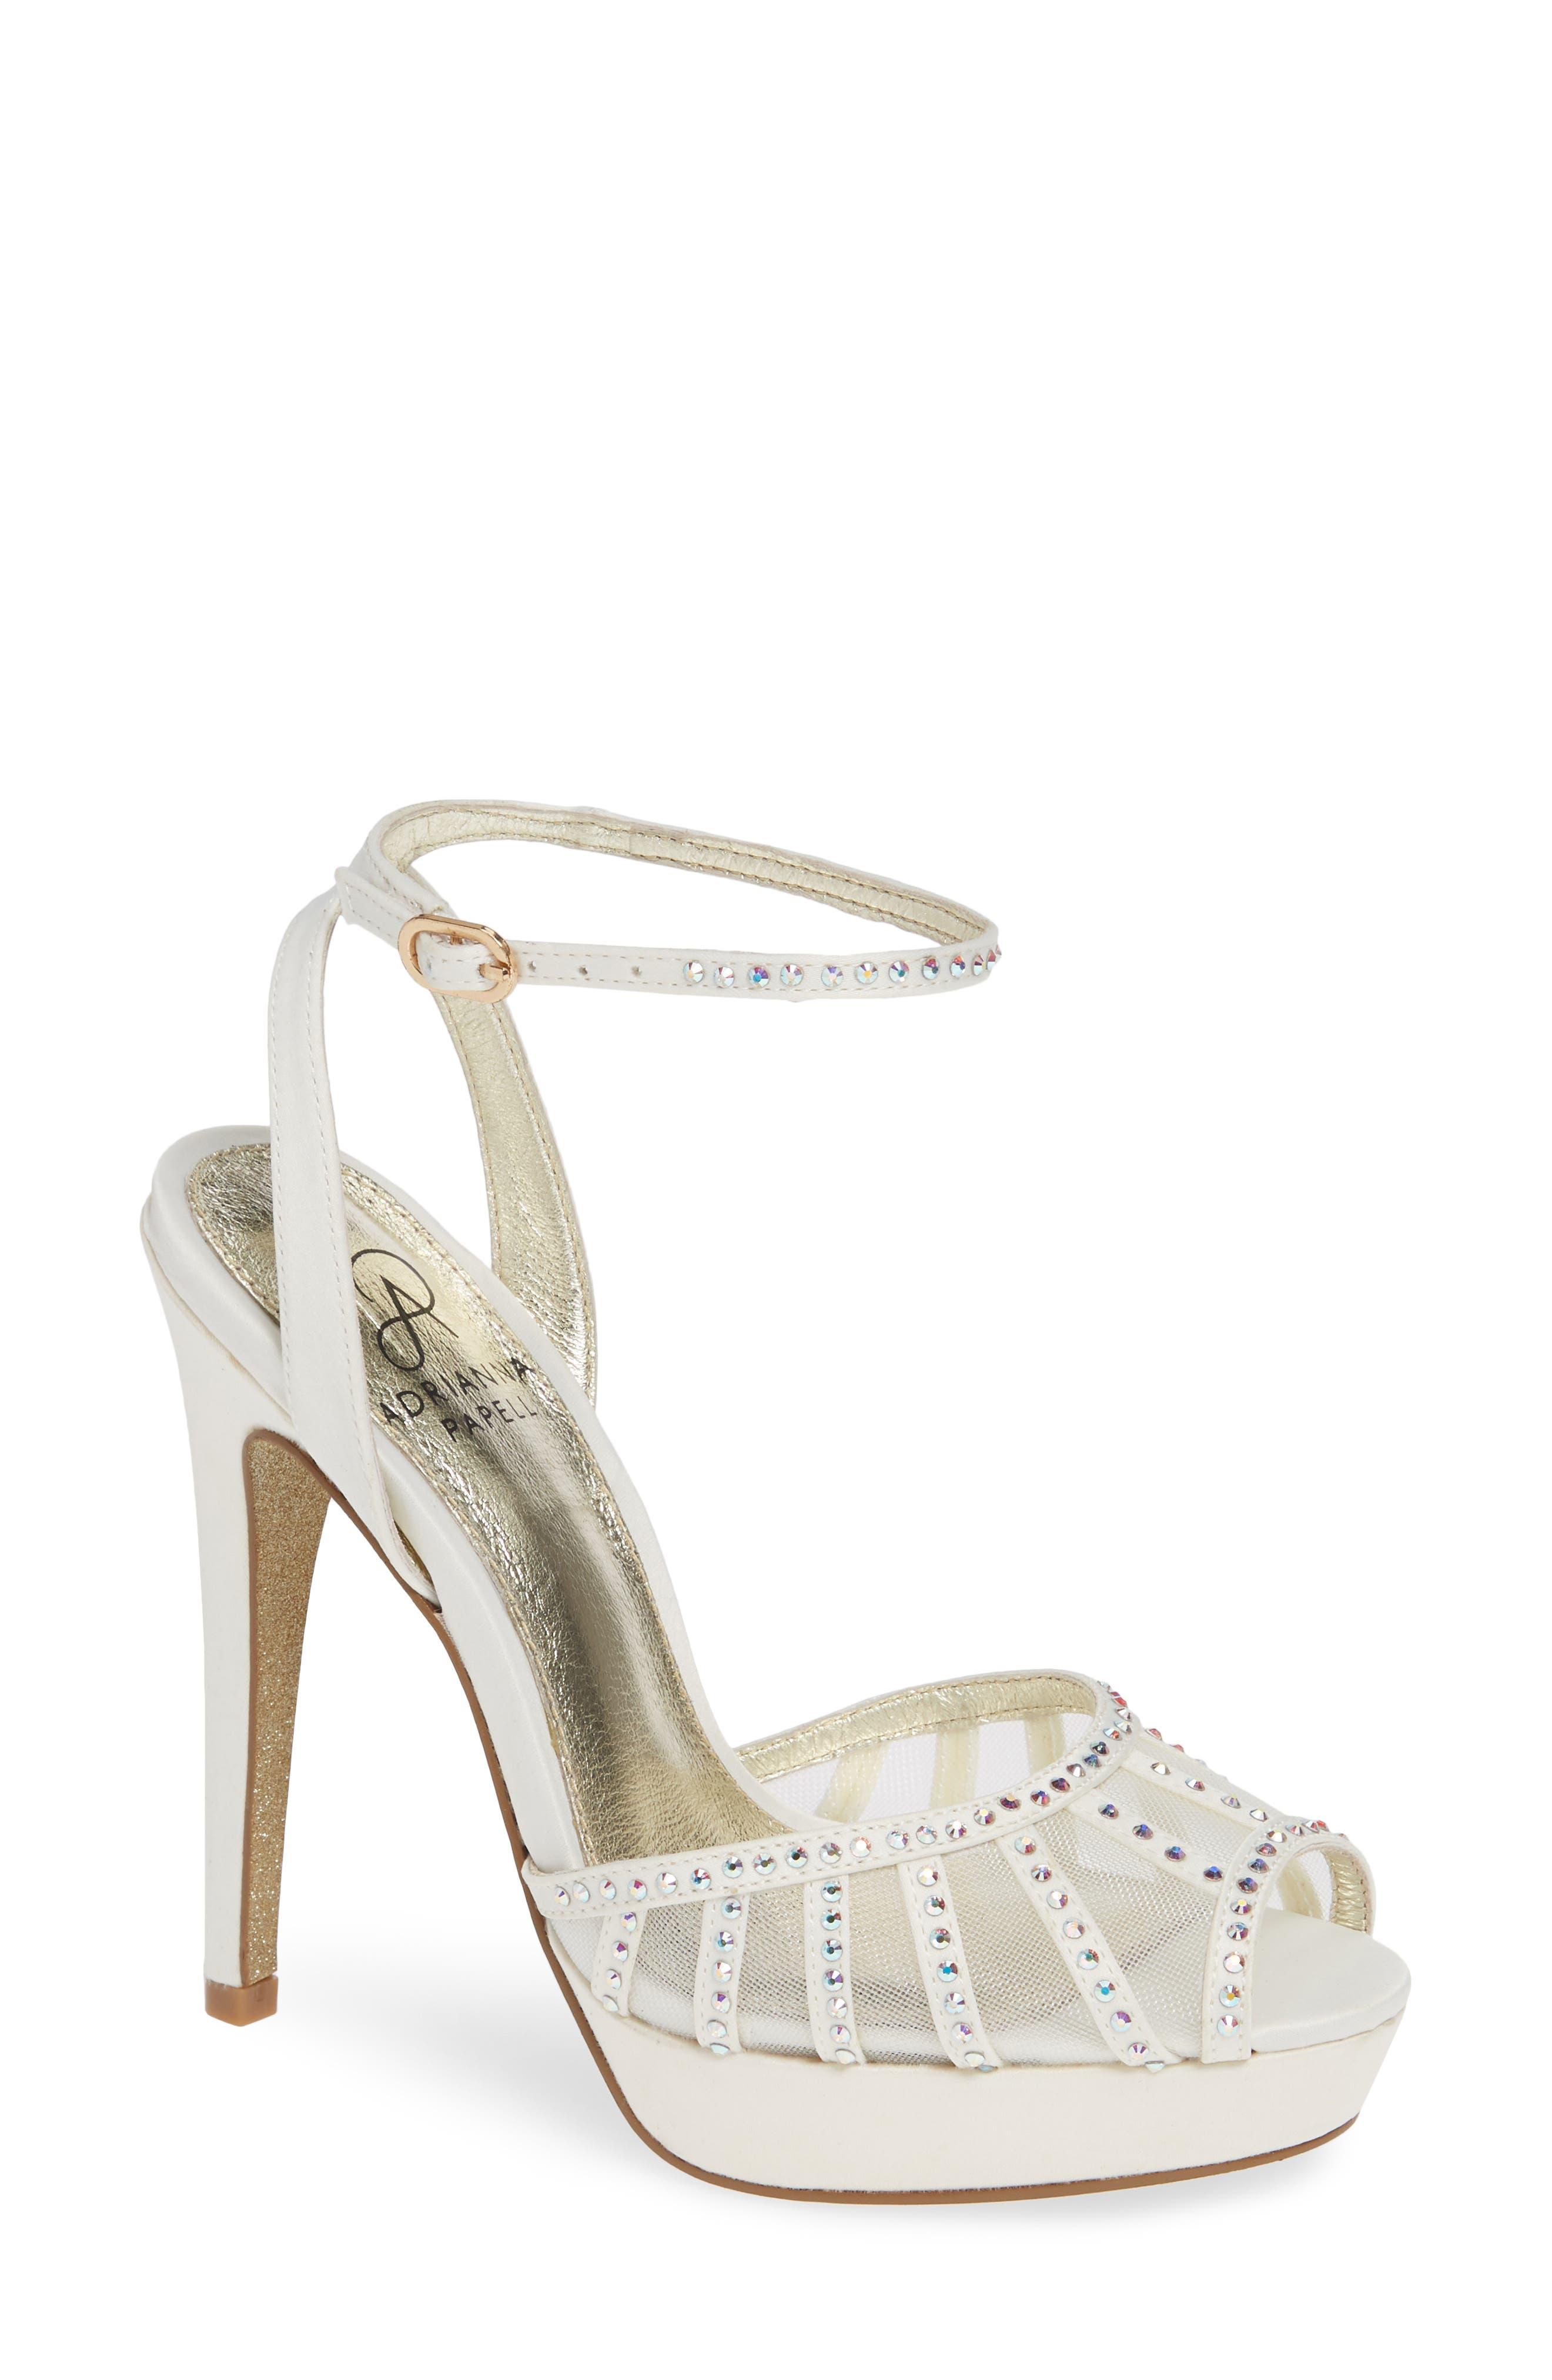 Simone Crystal Embellished Platform Sandal,                             Main thumbnail 1, color,                             Ivory